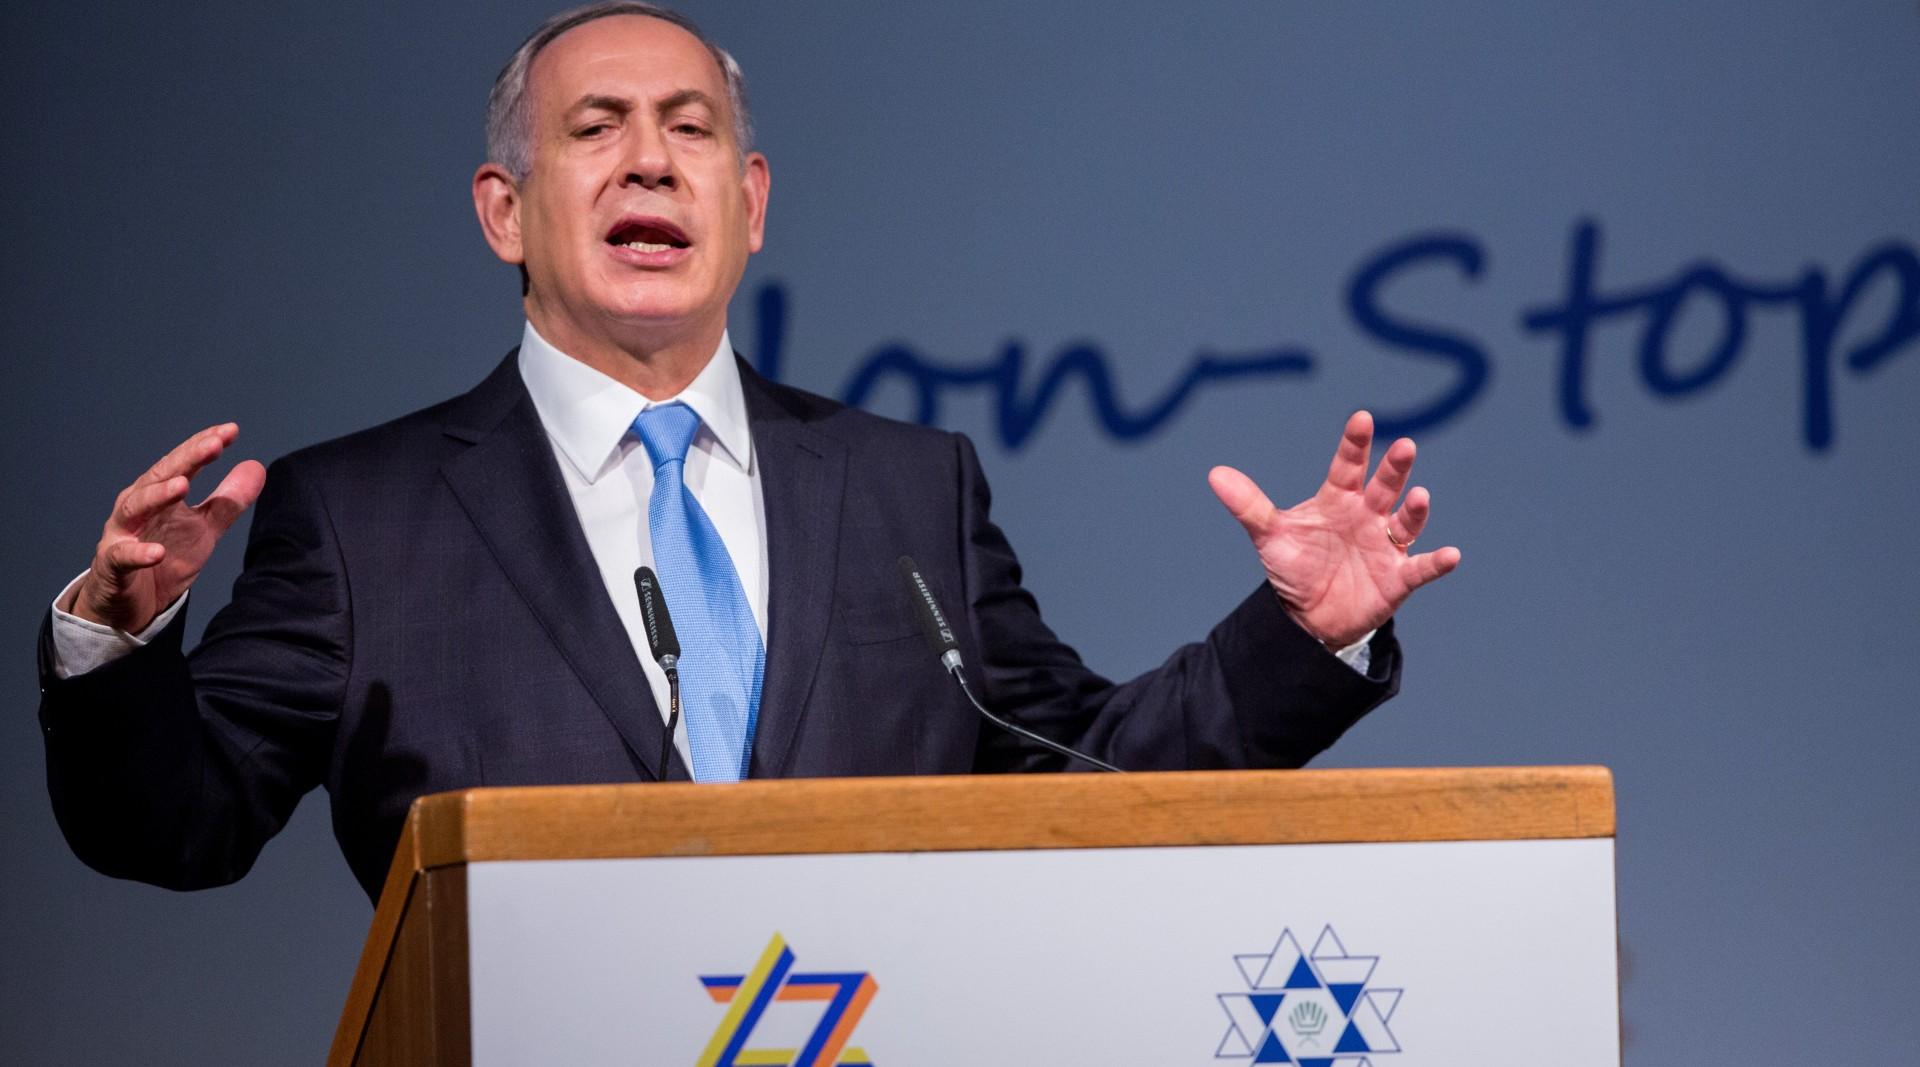 Israeli Prime Minister Benjamin Netanyahu speaks at the 37th World Zionist Congress in Jerusalem, Oct. 20, 2015. (JTA/Yonatan Sindel/Flash90)